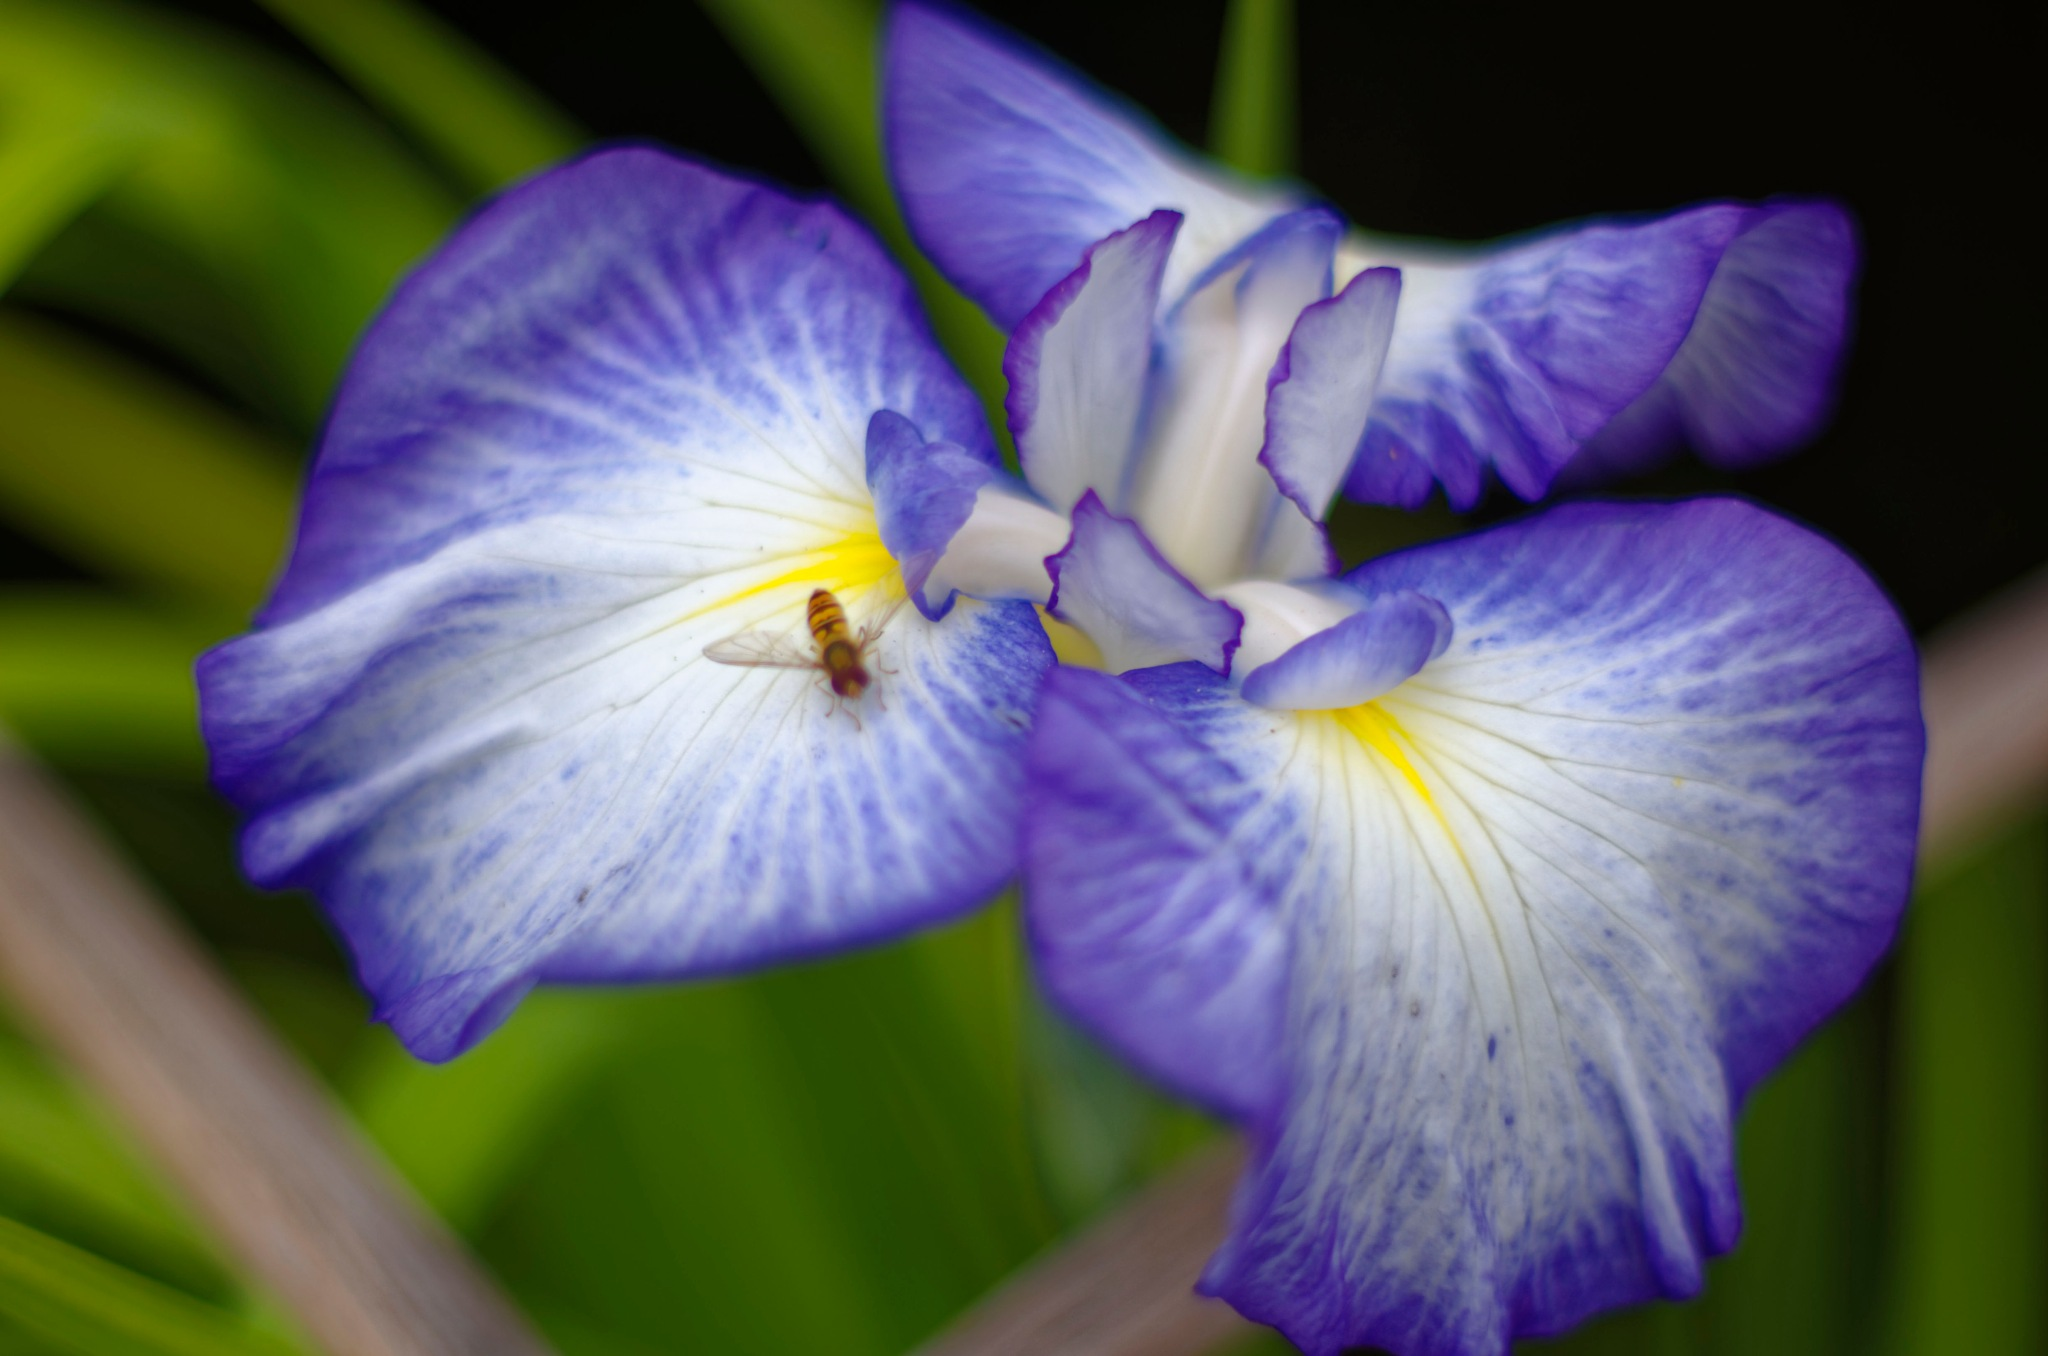 iris&hover fly by paulrobin.andrews